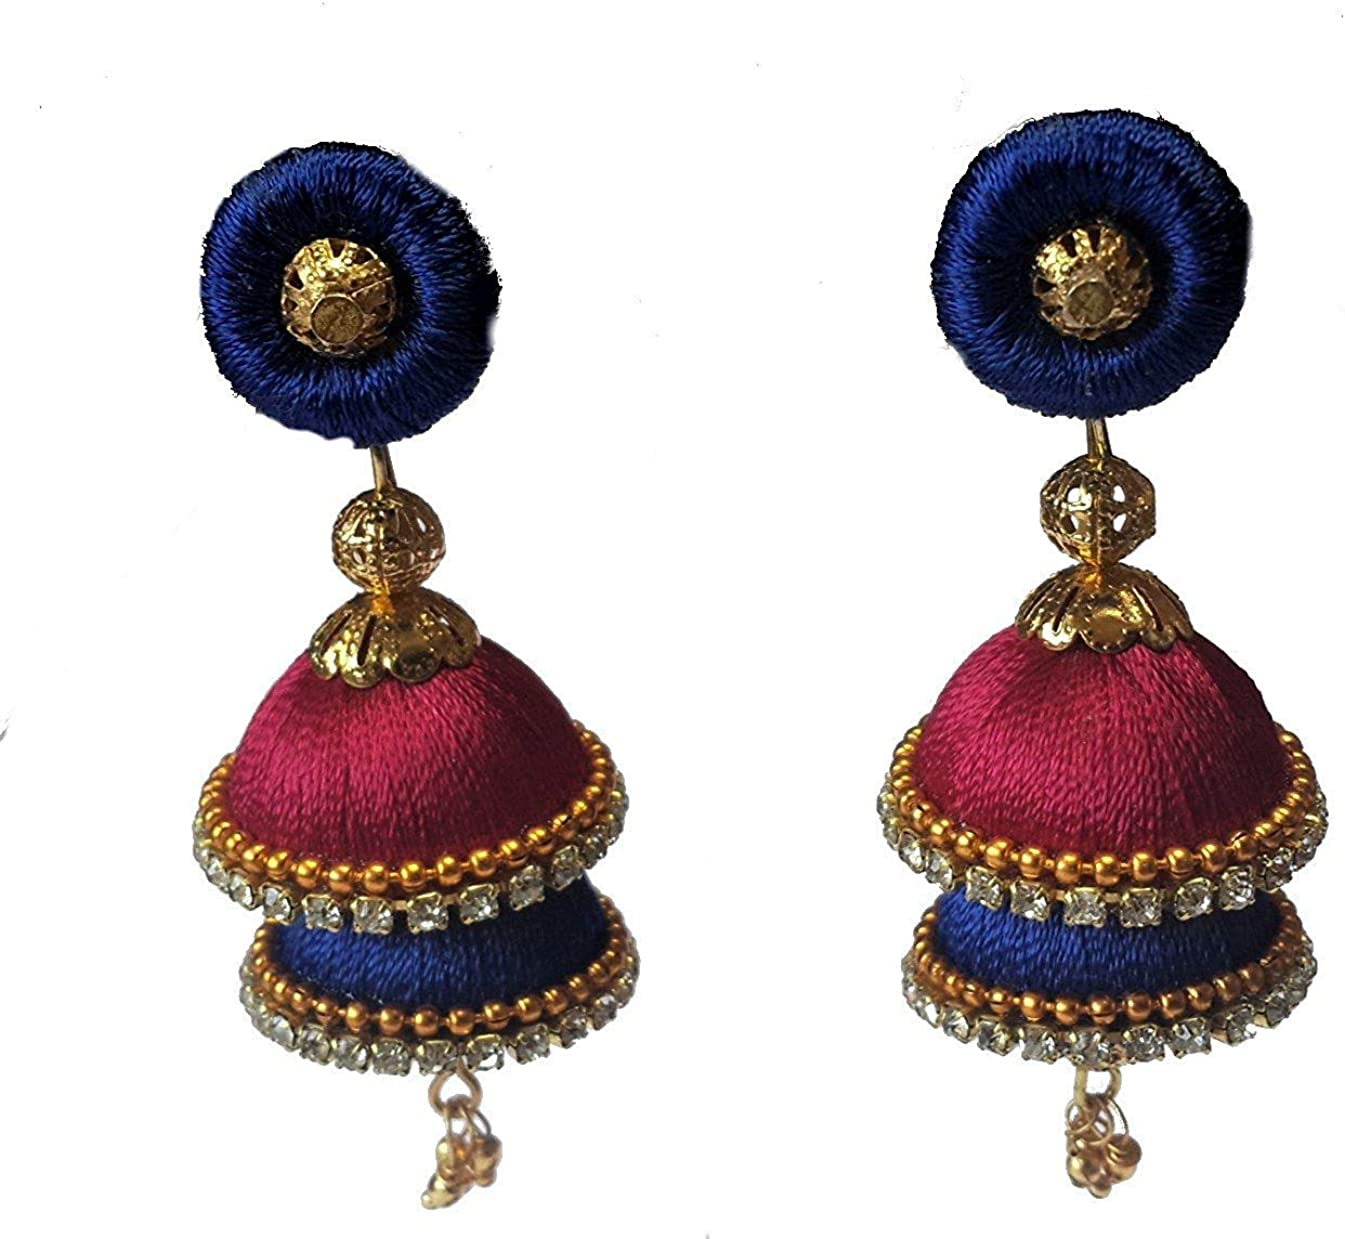 art palace Two-Step Styled, Blue & Rani-Pnk Colored, Silk/Resham Thread Jhumka with Detachable Stud